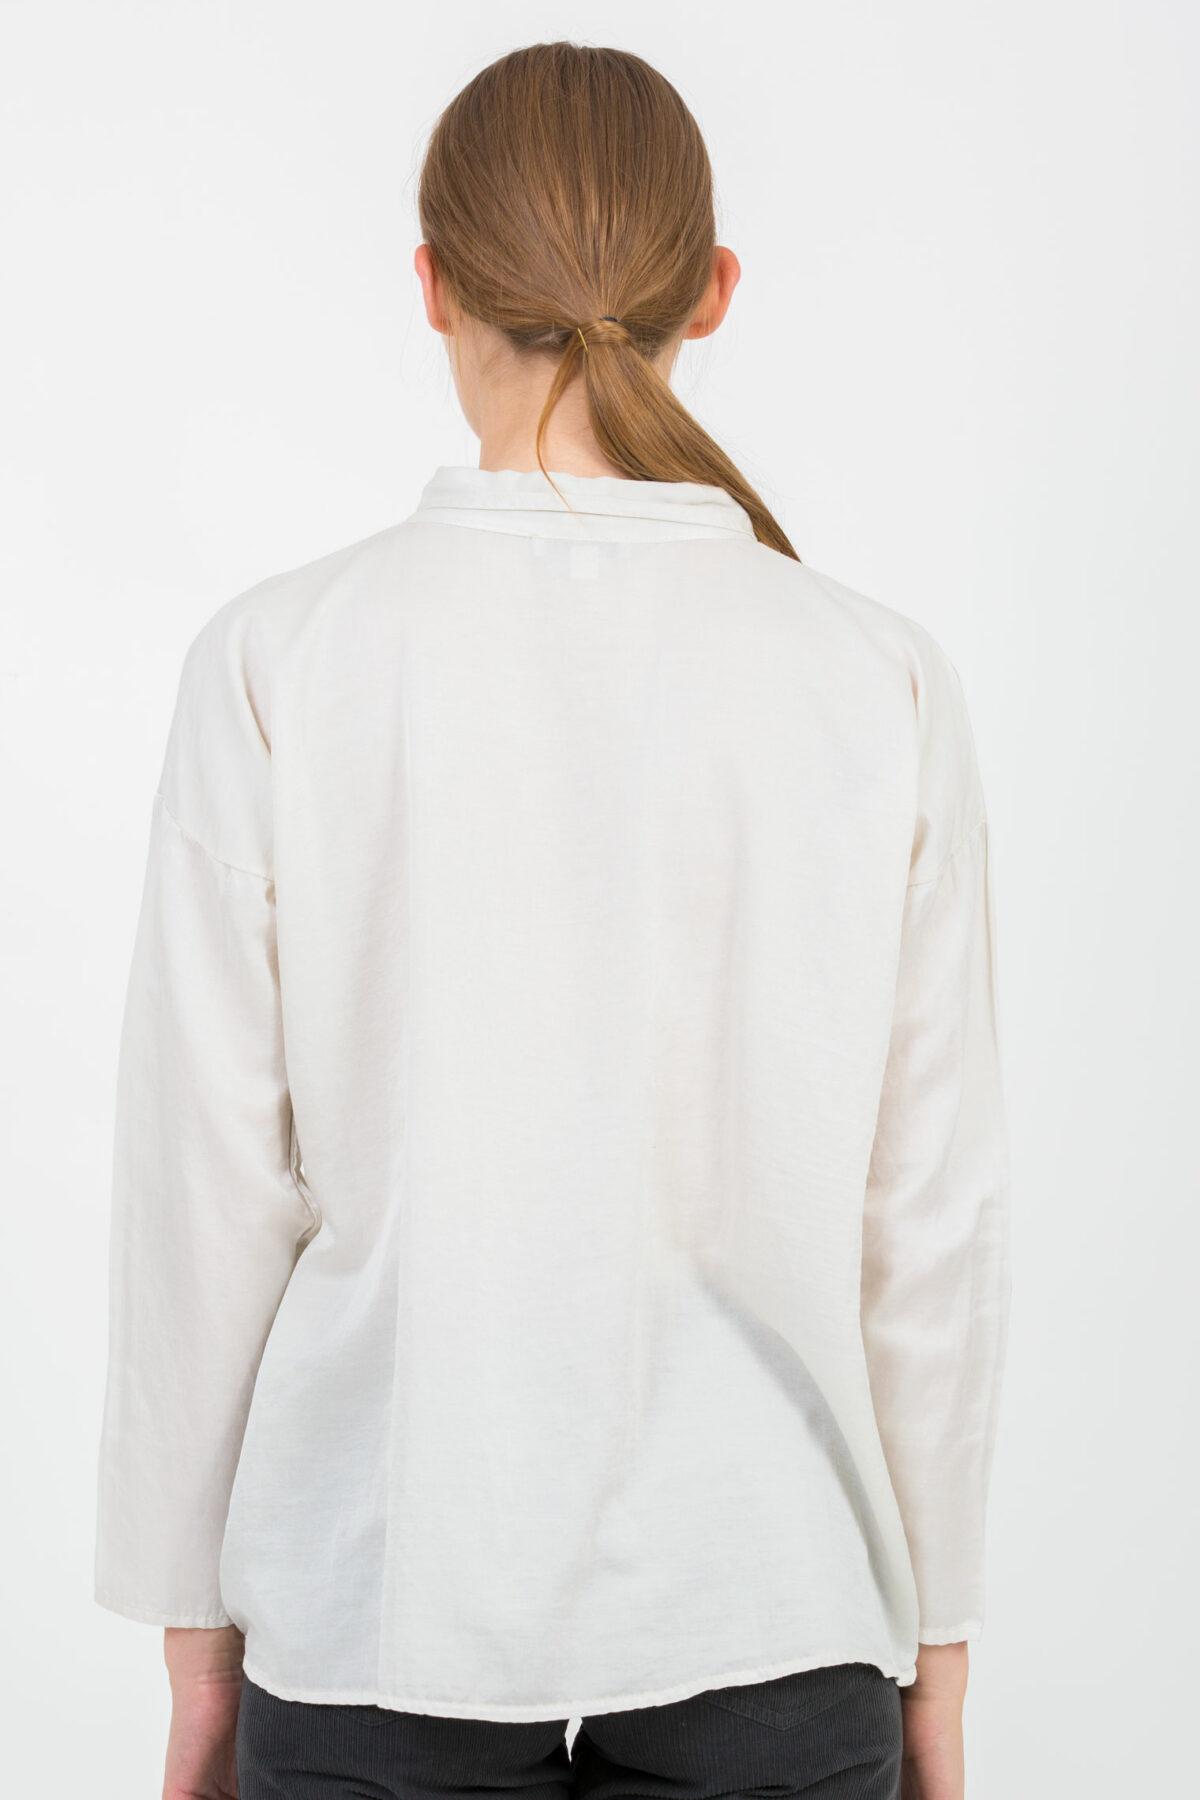 lest-pearl-grey-shirt-oversize-silk-crossley-matchboxathens